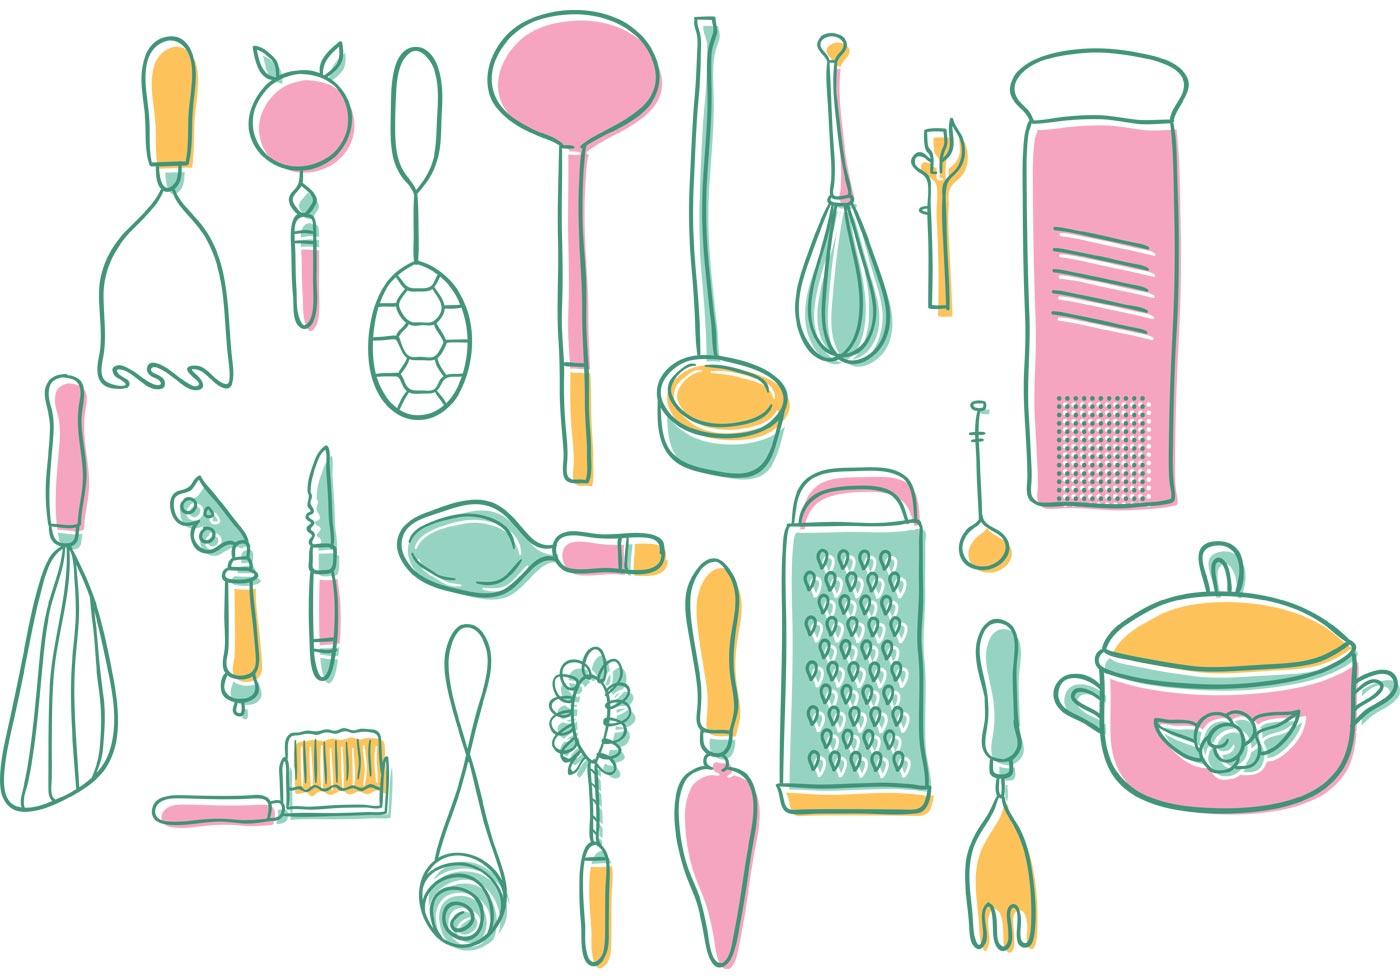 Vintage kitchen utensils clipart 6 » Clipart Station.